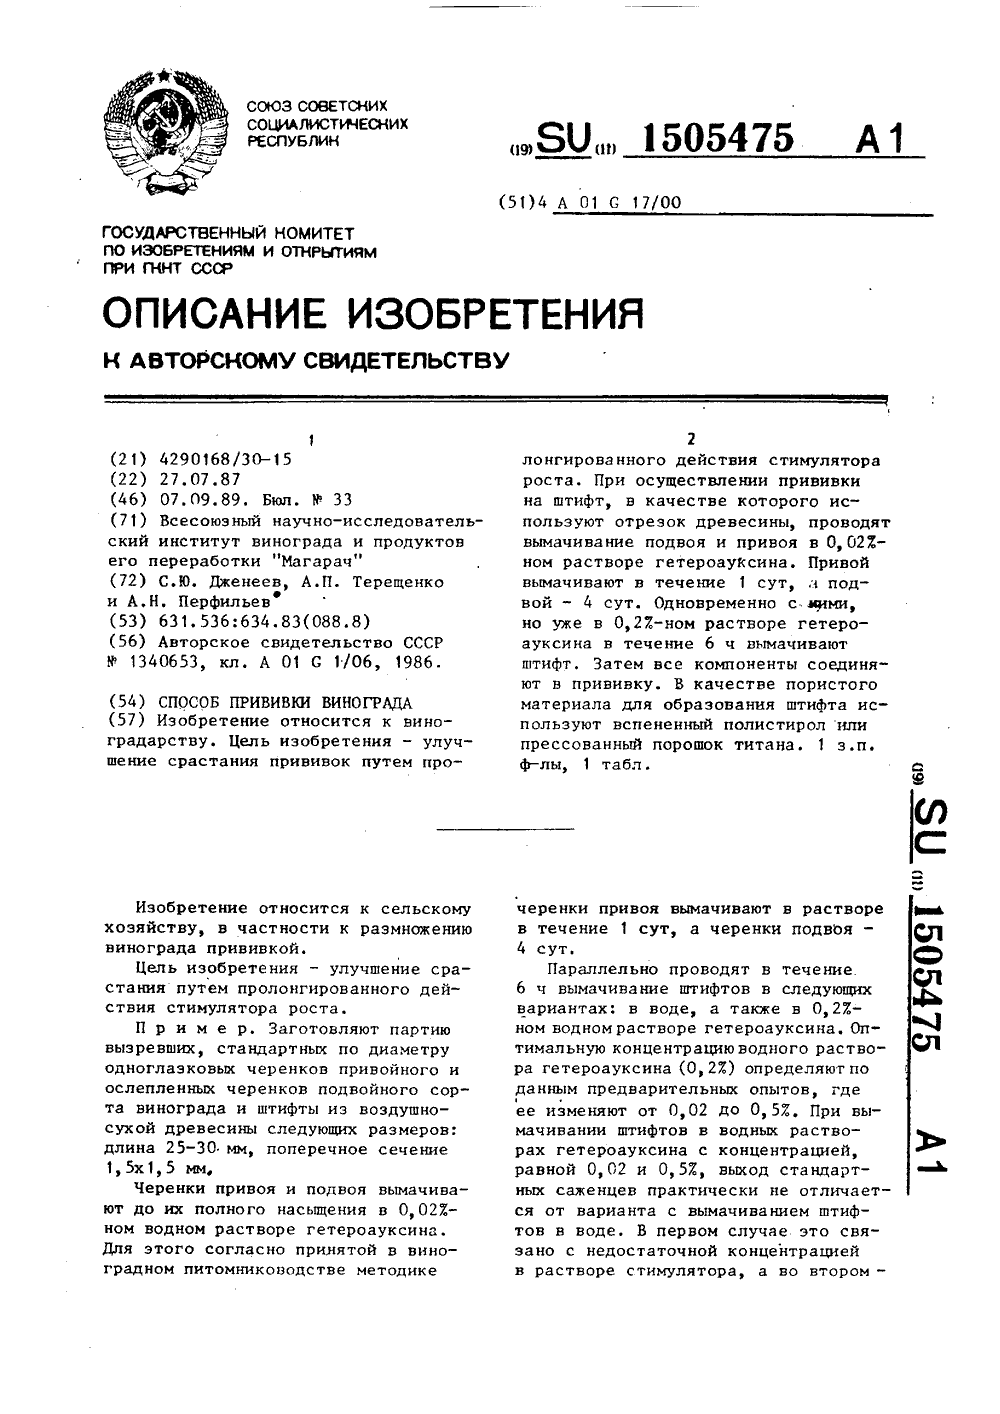 Применение гетероауксина в институте магарач